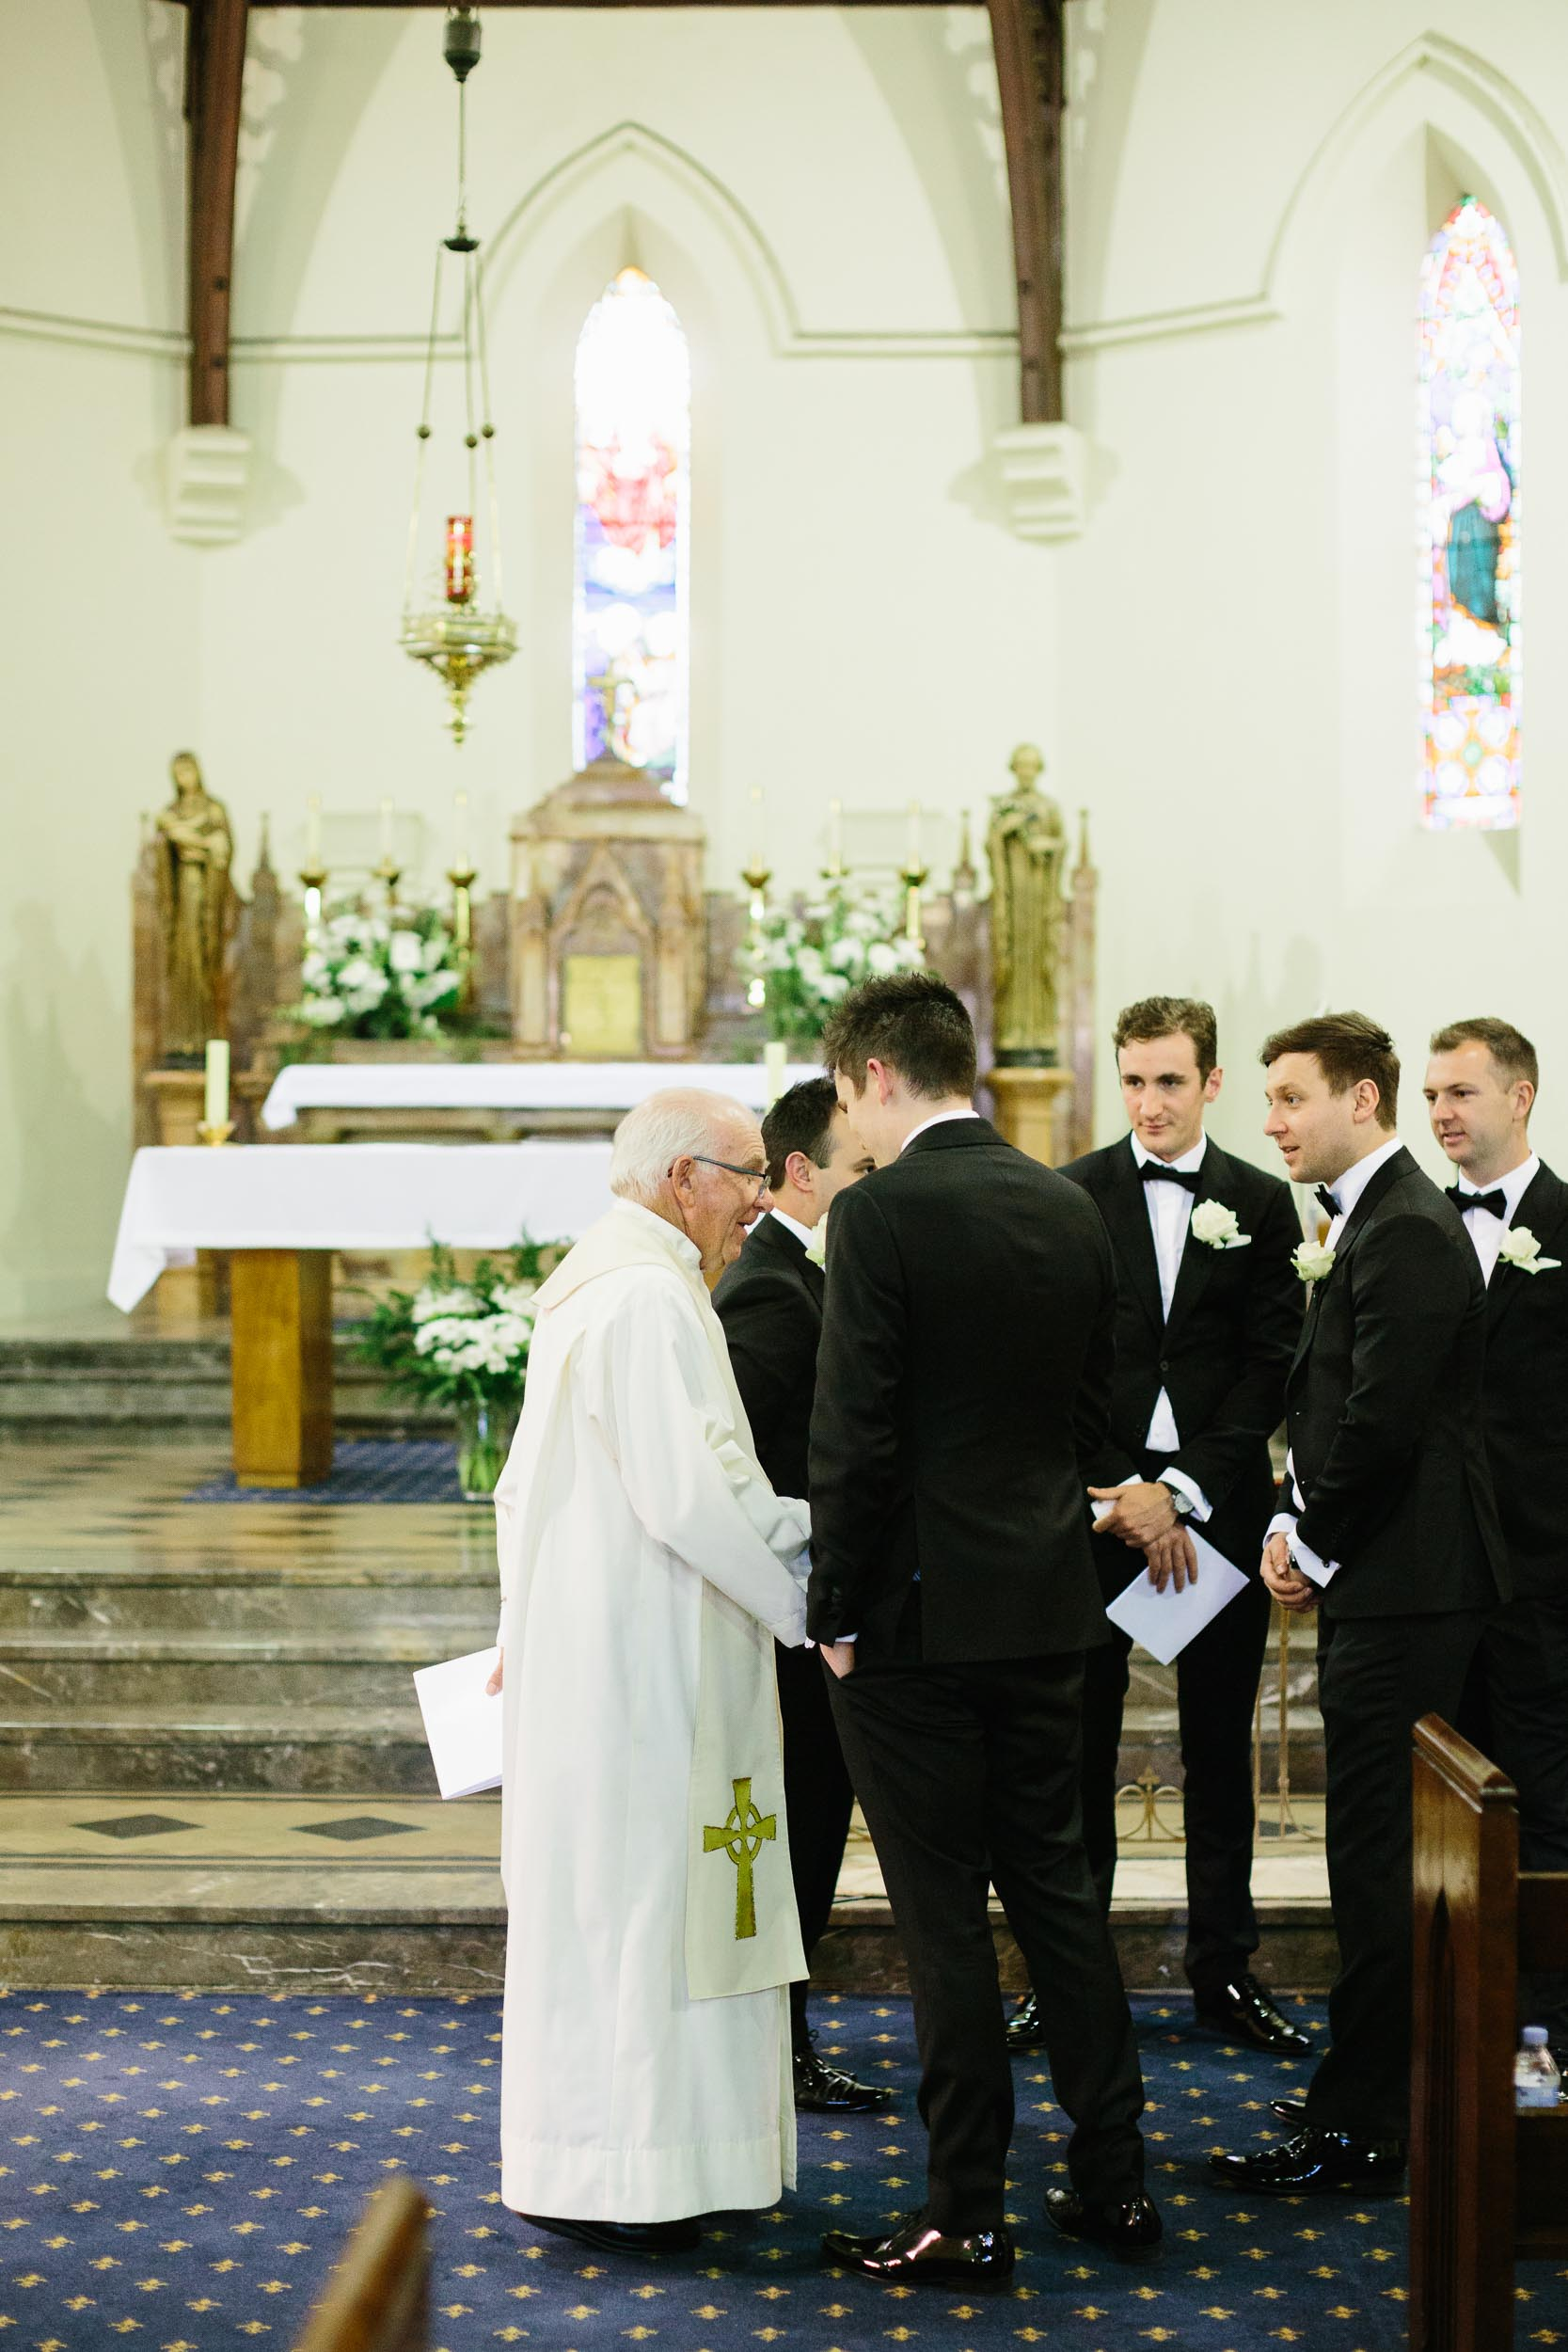 Kas-Richards-Wedding-Photographer-Melbourne-City-Wedding-Alto-Event-Space-Jane-Hill-Bridal-Gown-19.jpg